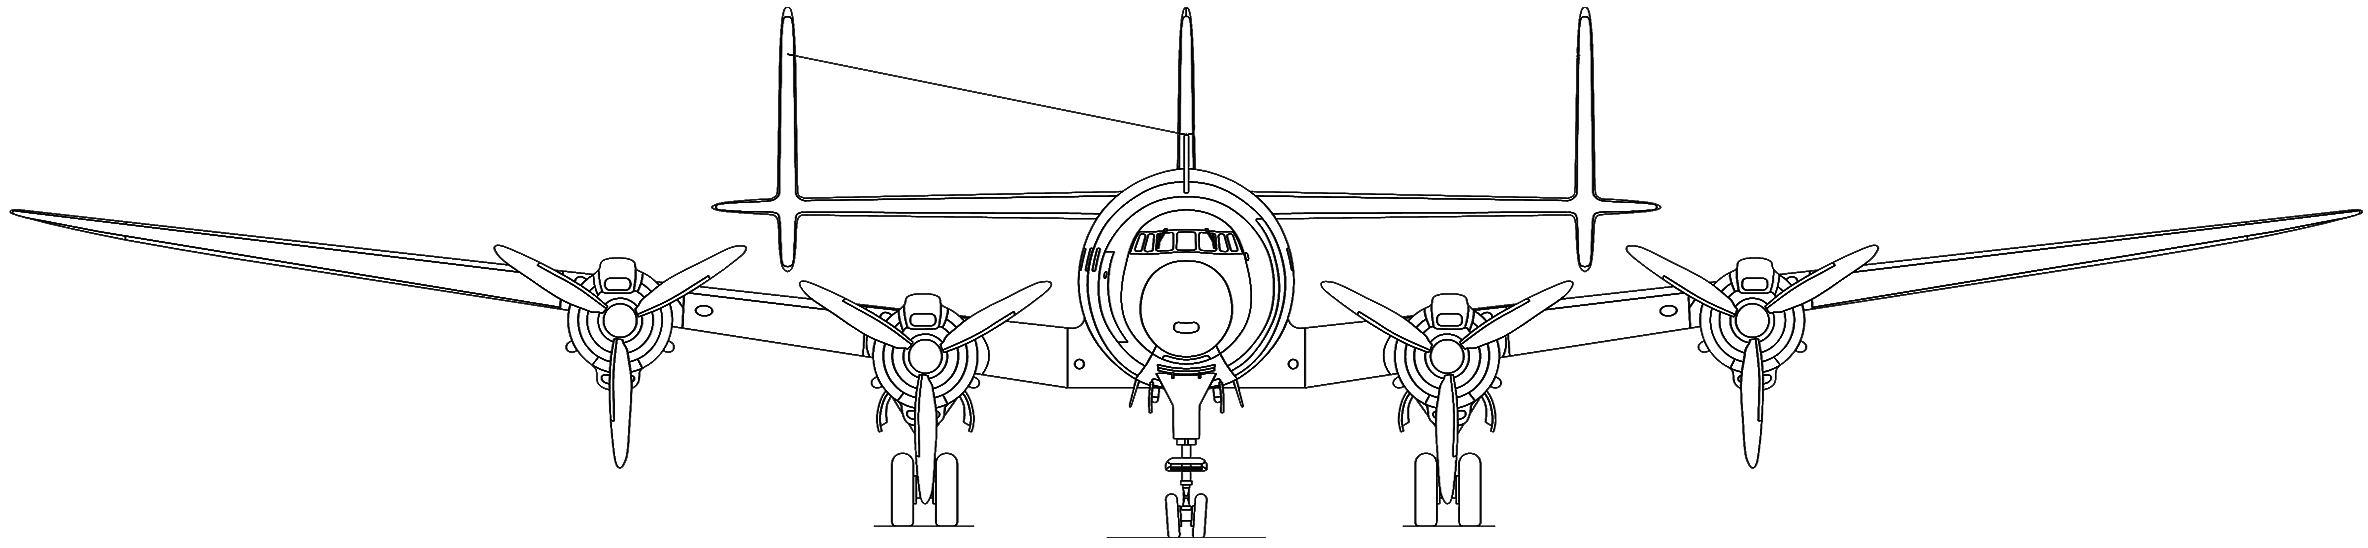 Boucle ceinture Air France Super Constellation